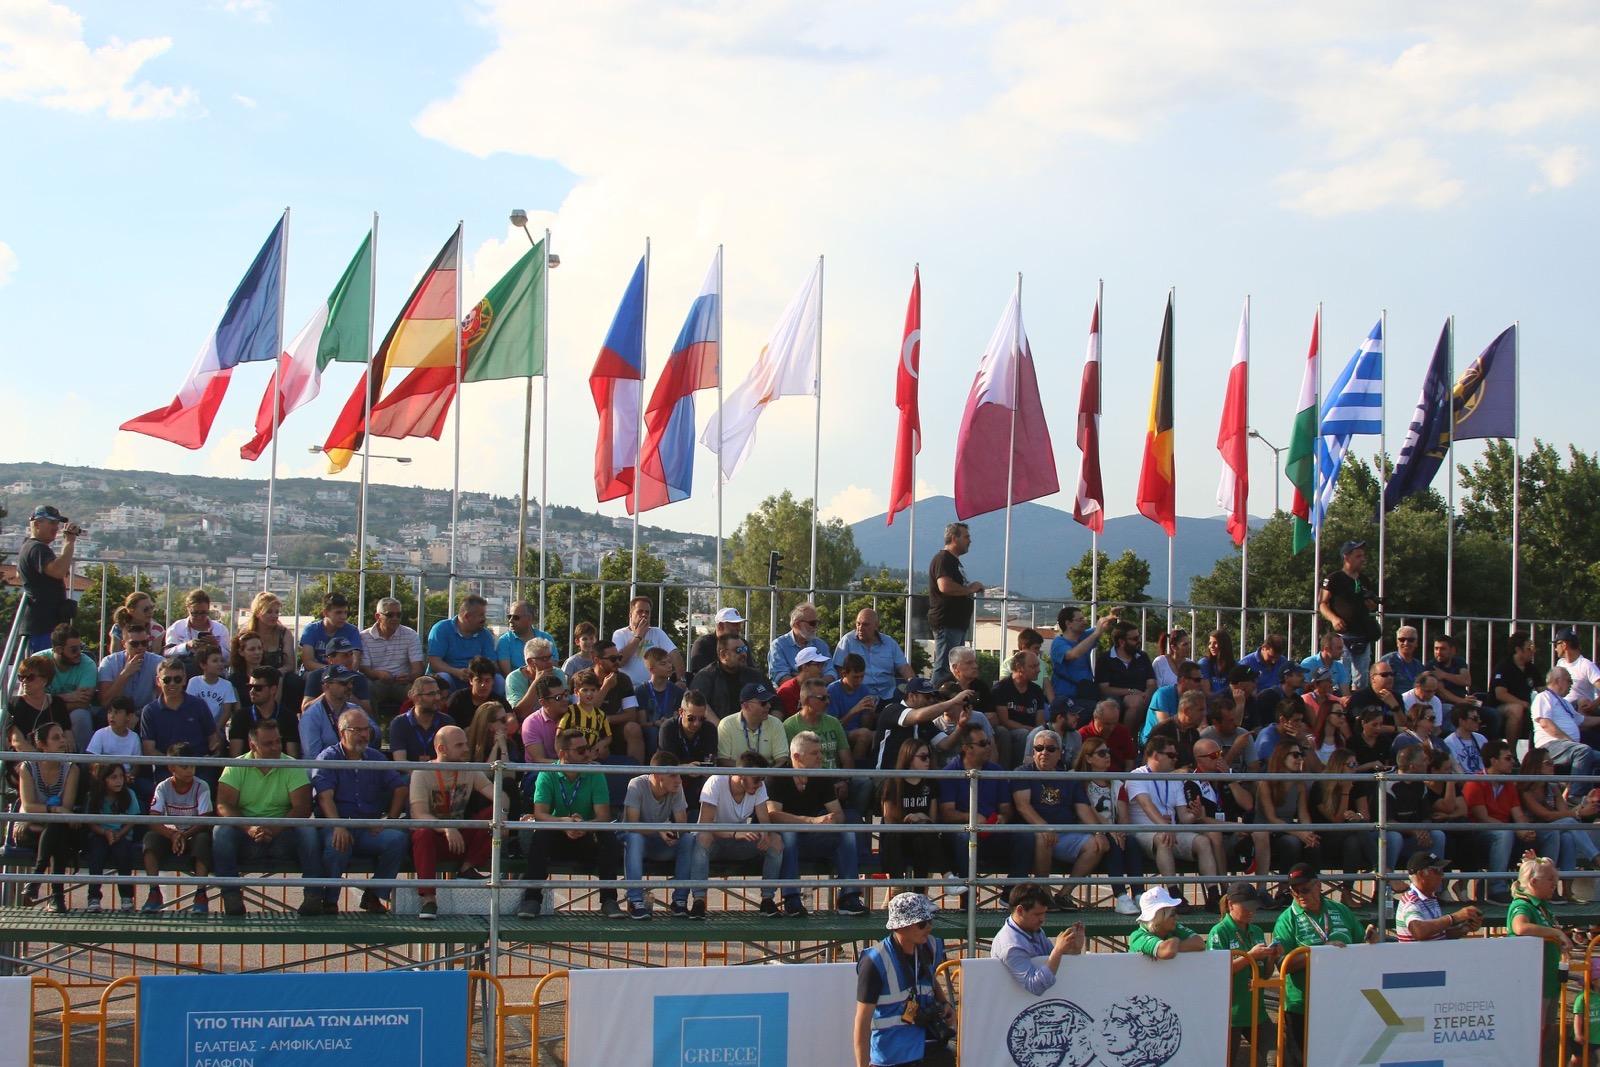 Rally_Acropolis_2017_Ceremonial_Start_20